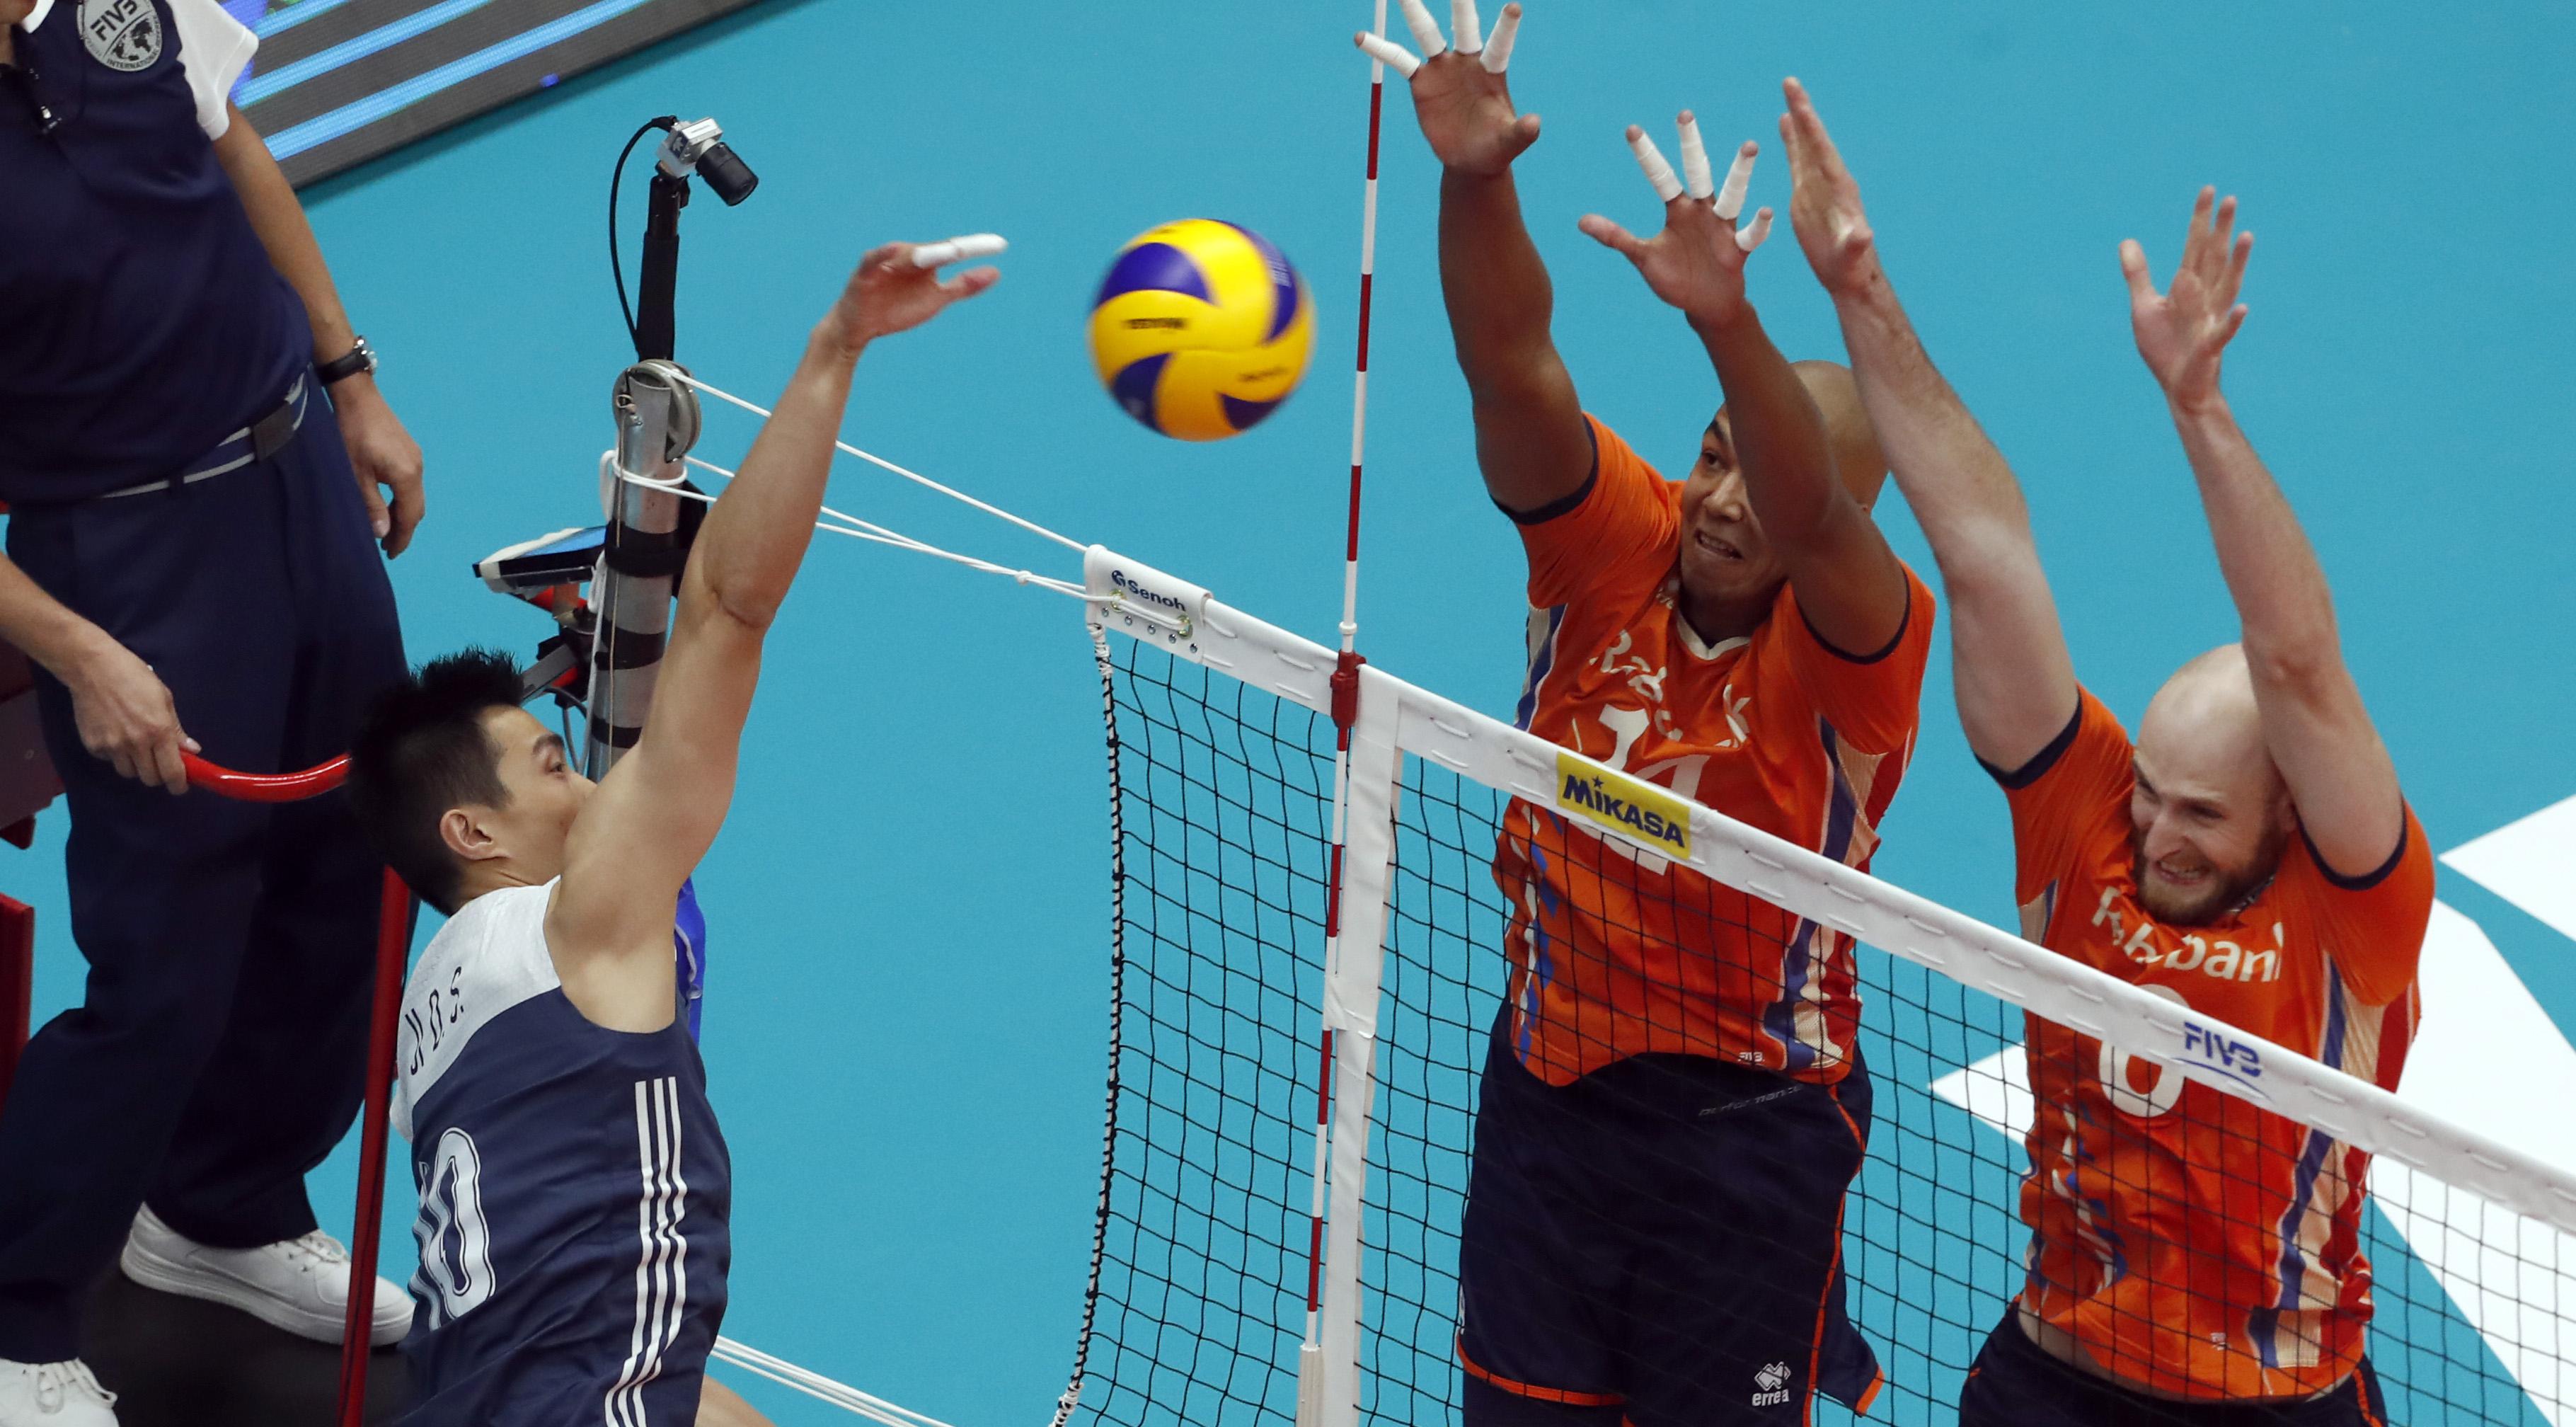 Post Match China Netherlands Fivb Volleyball Mens World Net Bola Voli Mikasa Volley Download